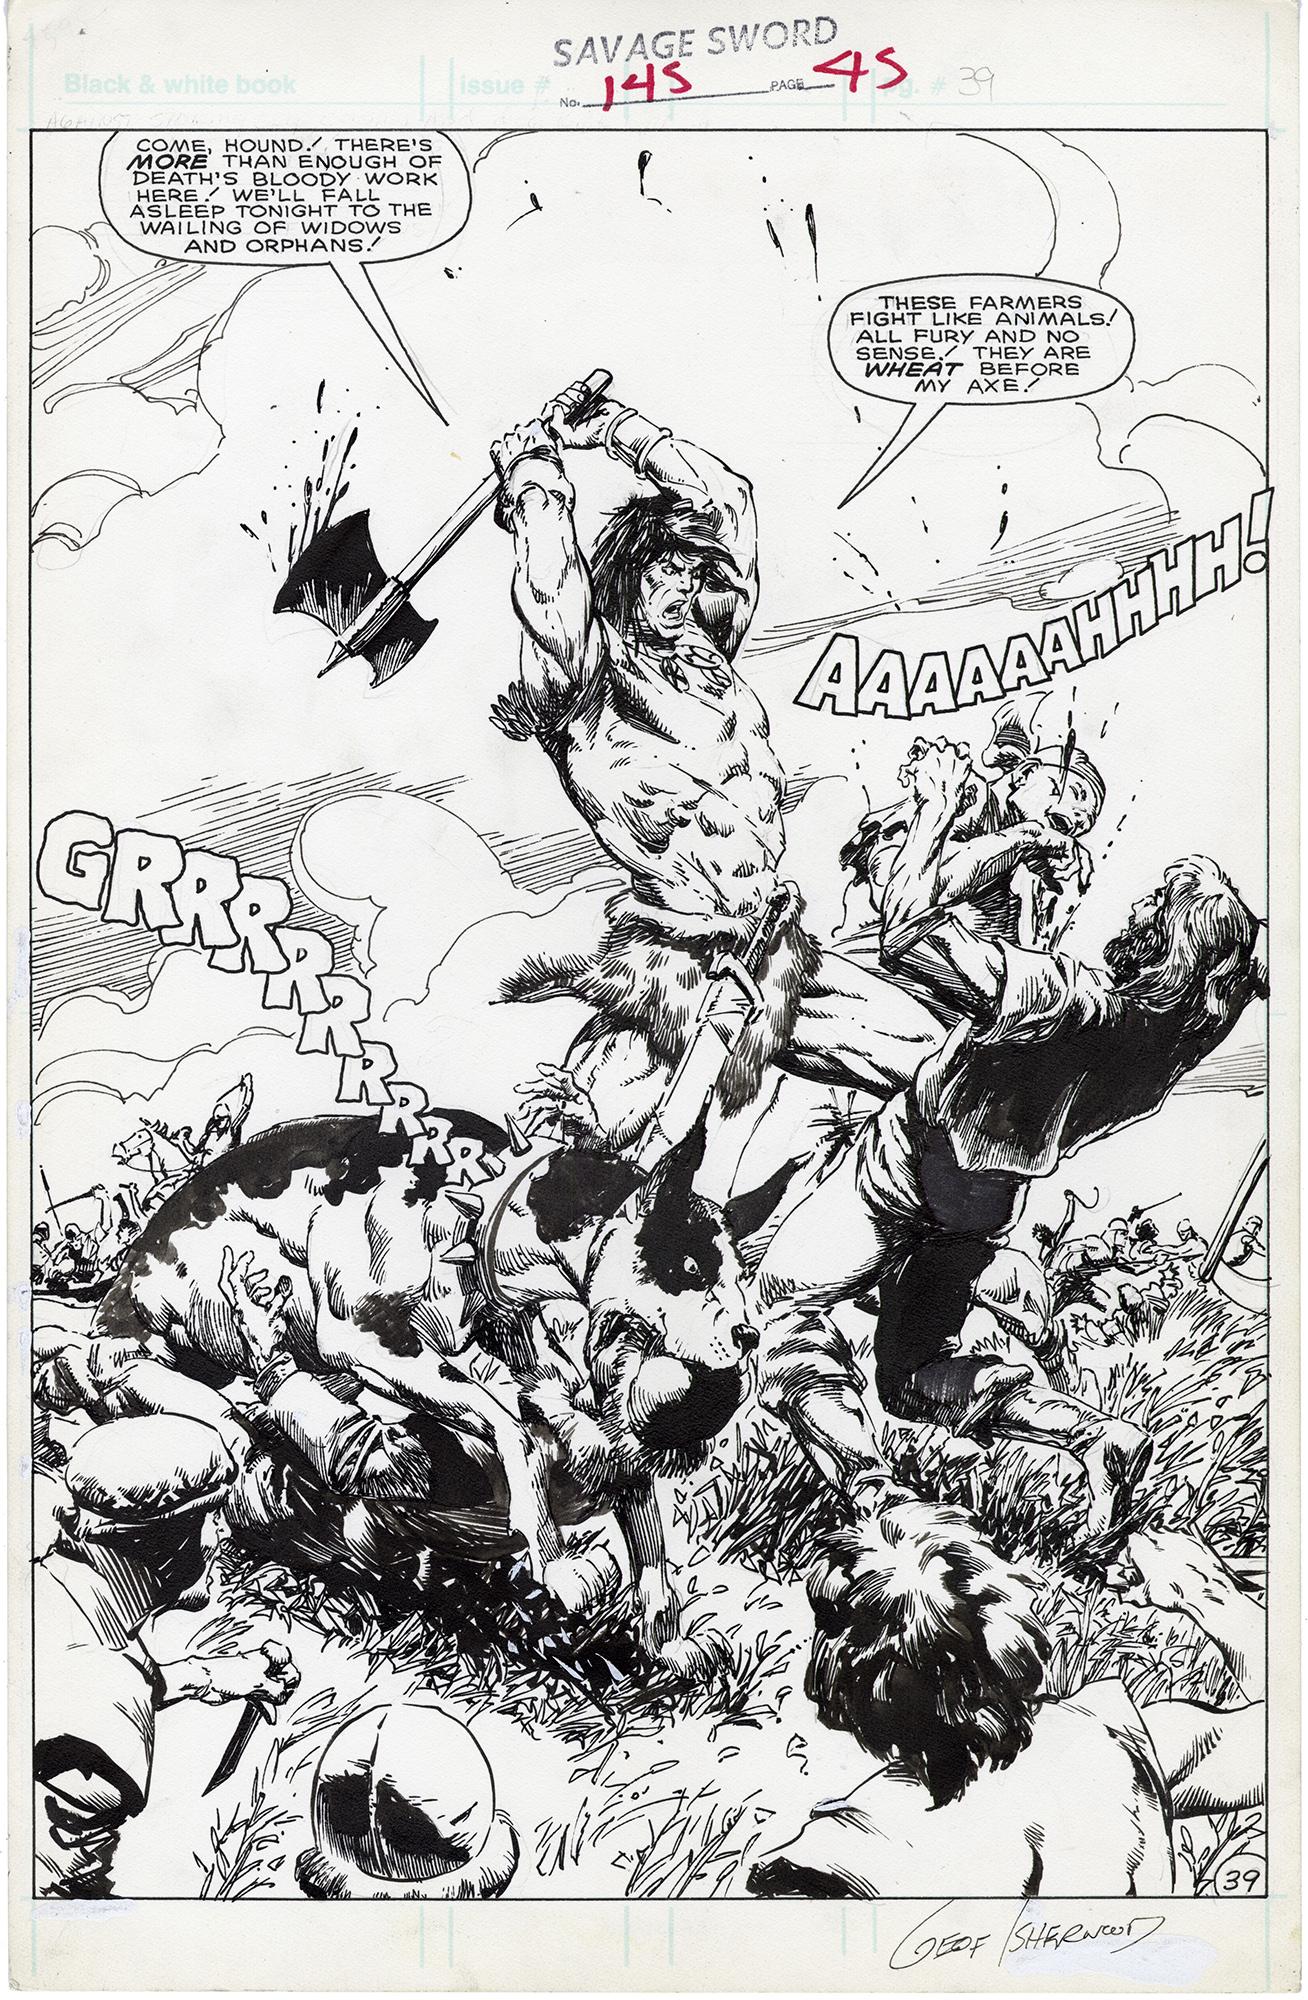 Savage Sword Of Conan #145 p39